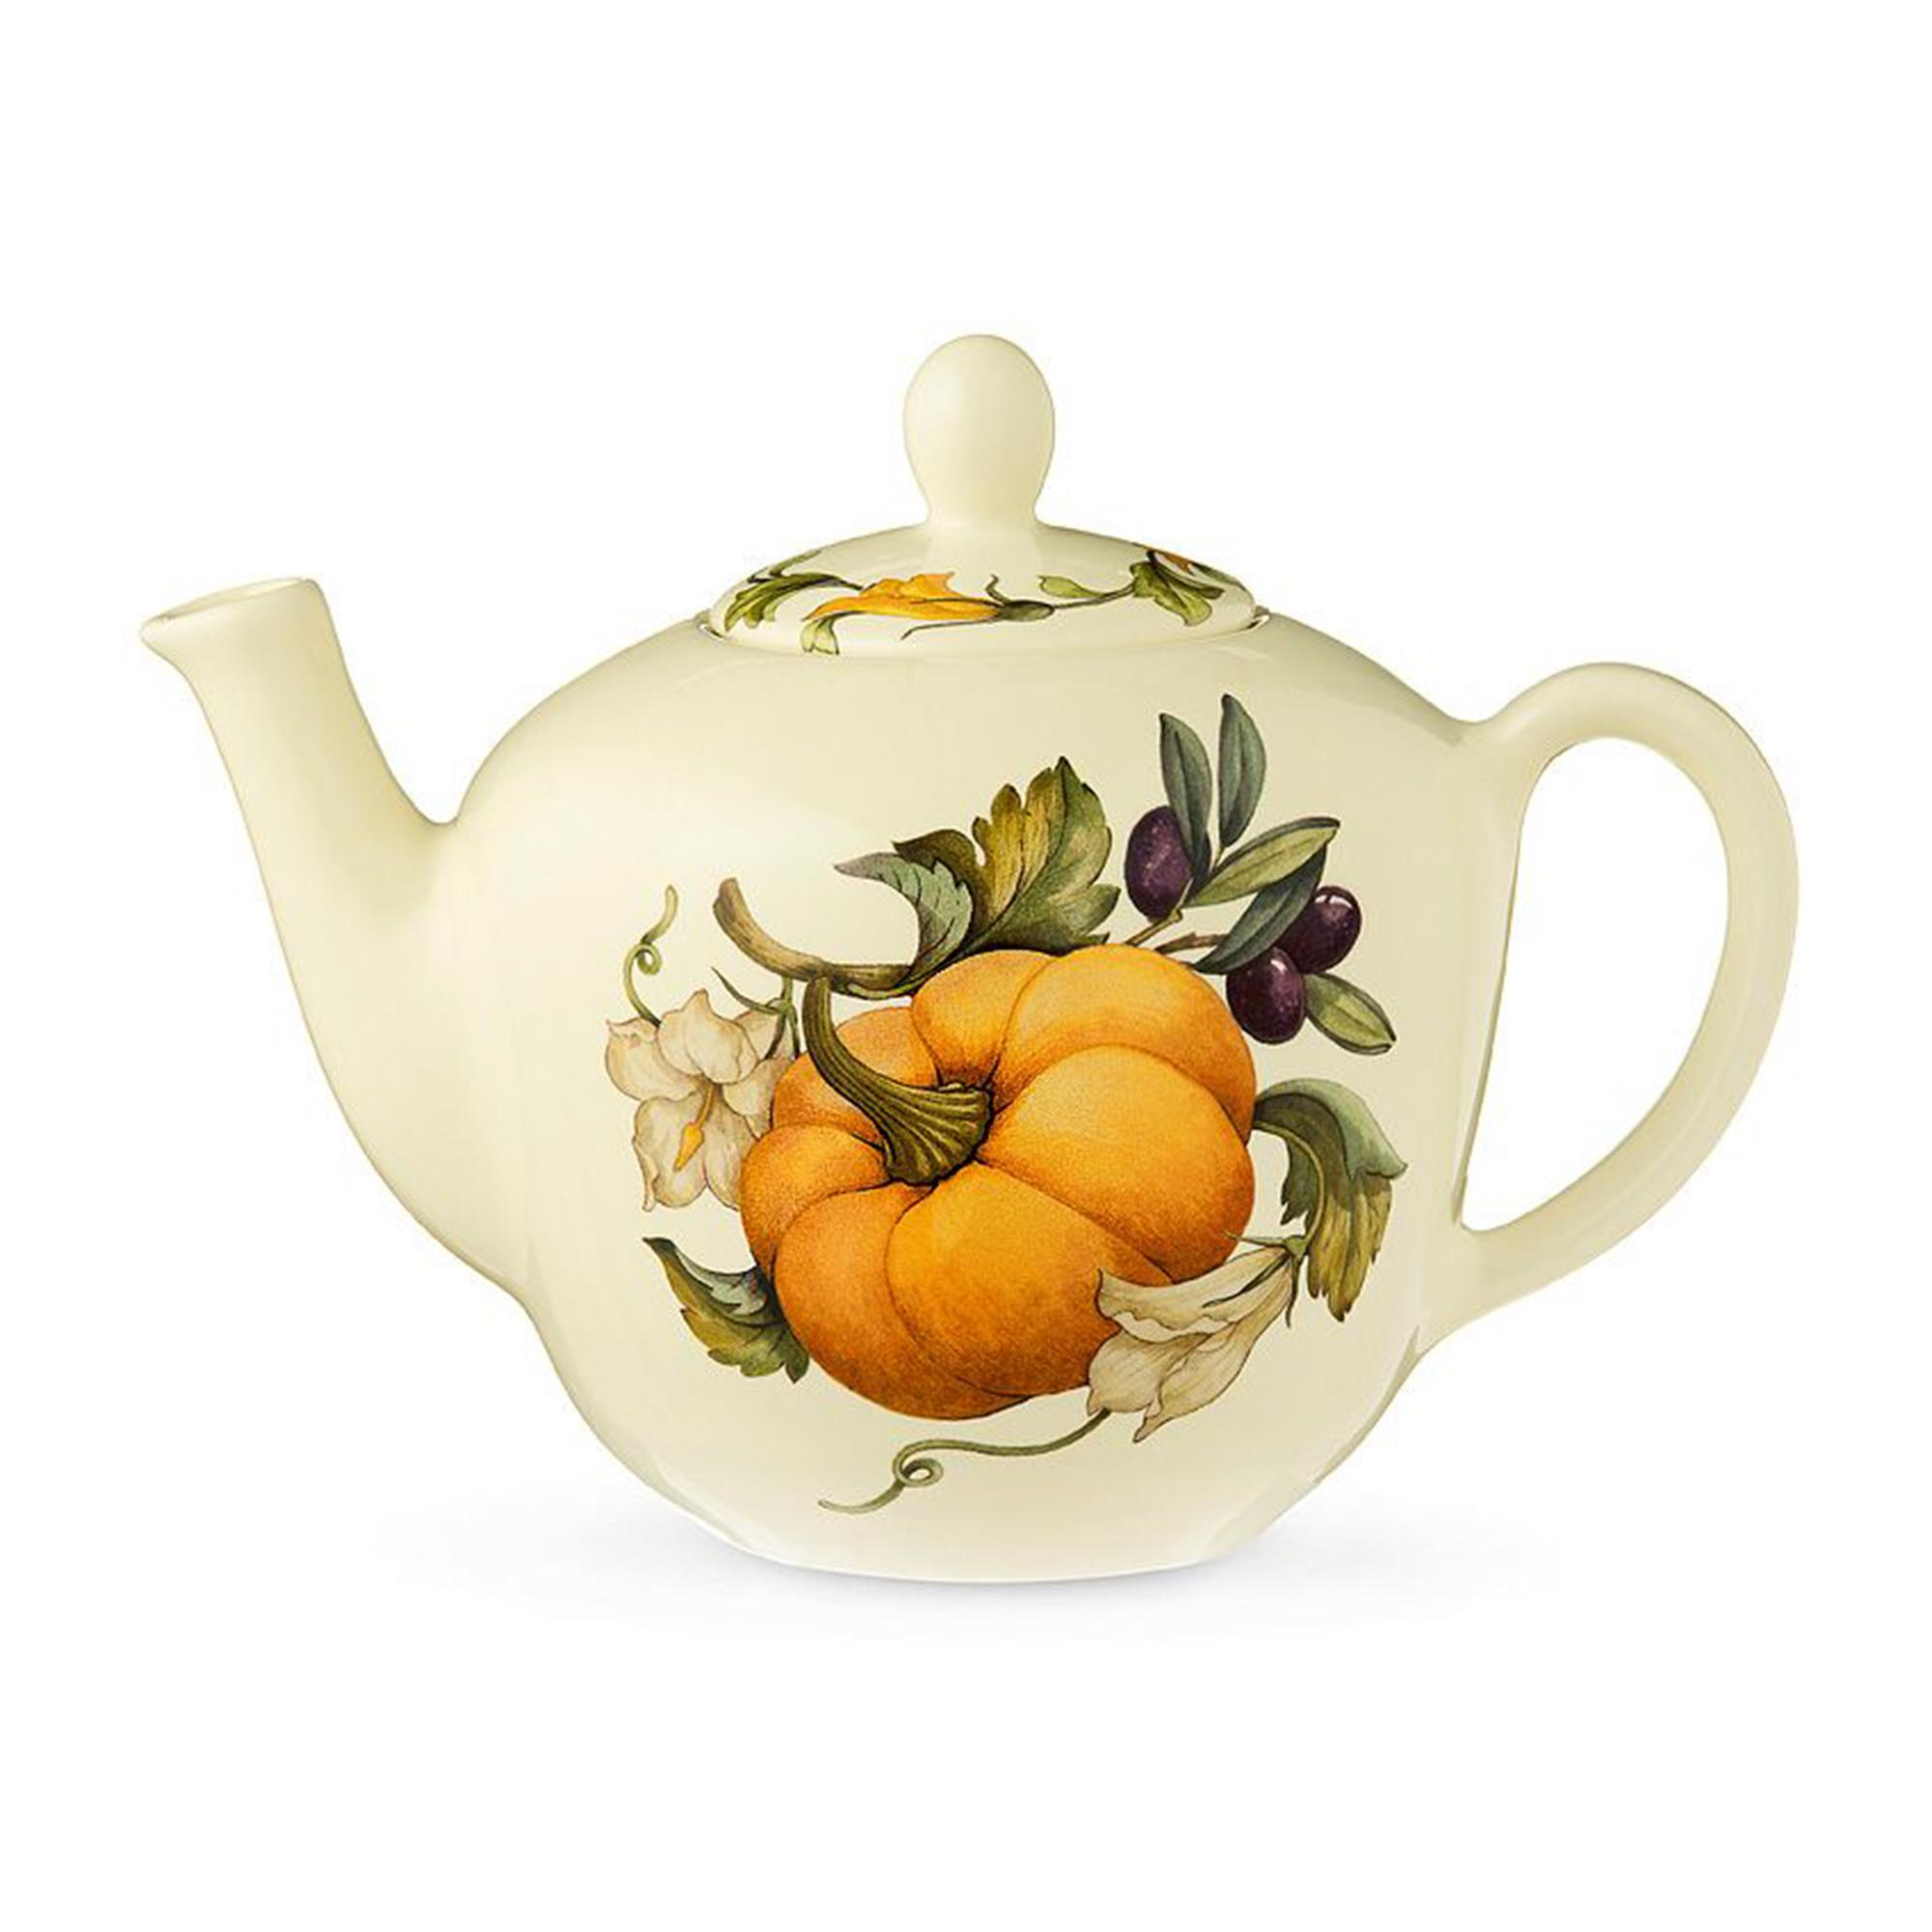 Чайник заварочный Nuova cer S.N.C. Тыква 1 л заварочный чайник 1 5 л lilac 5520010 1